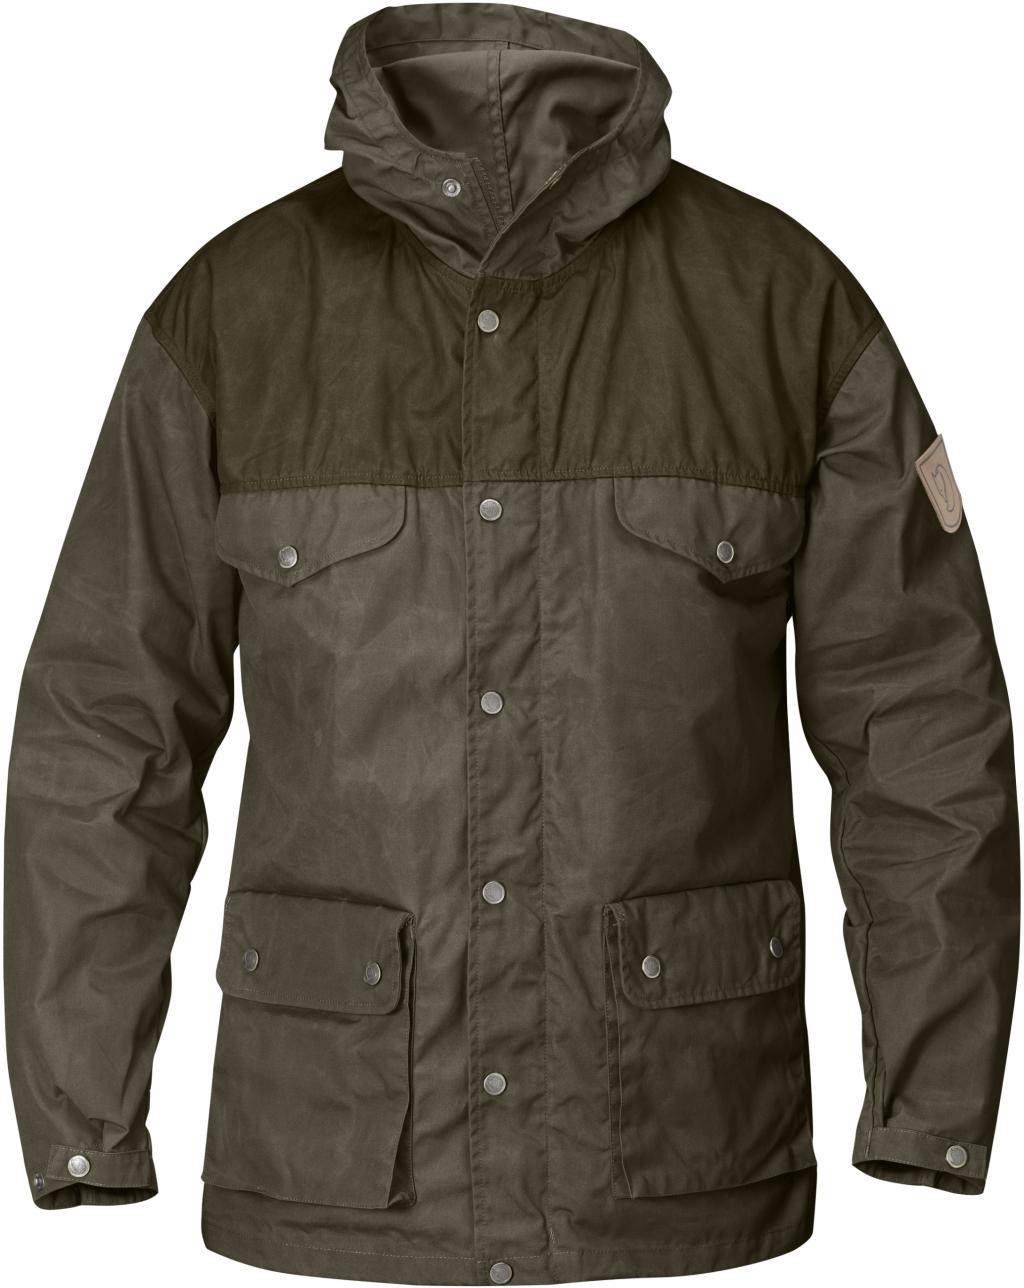 FjallRaven Greenland Jacket Tarmac-30